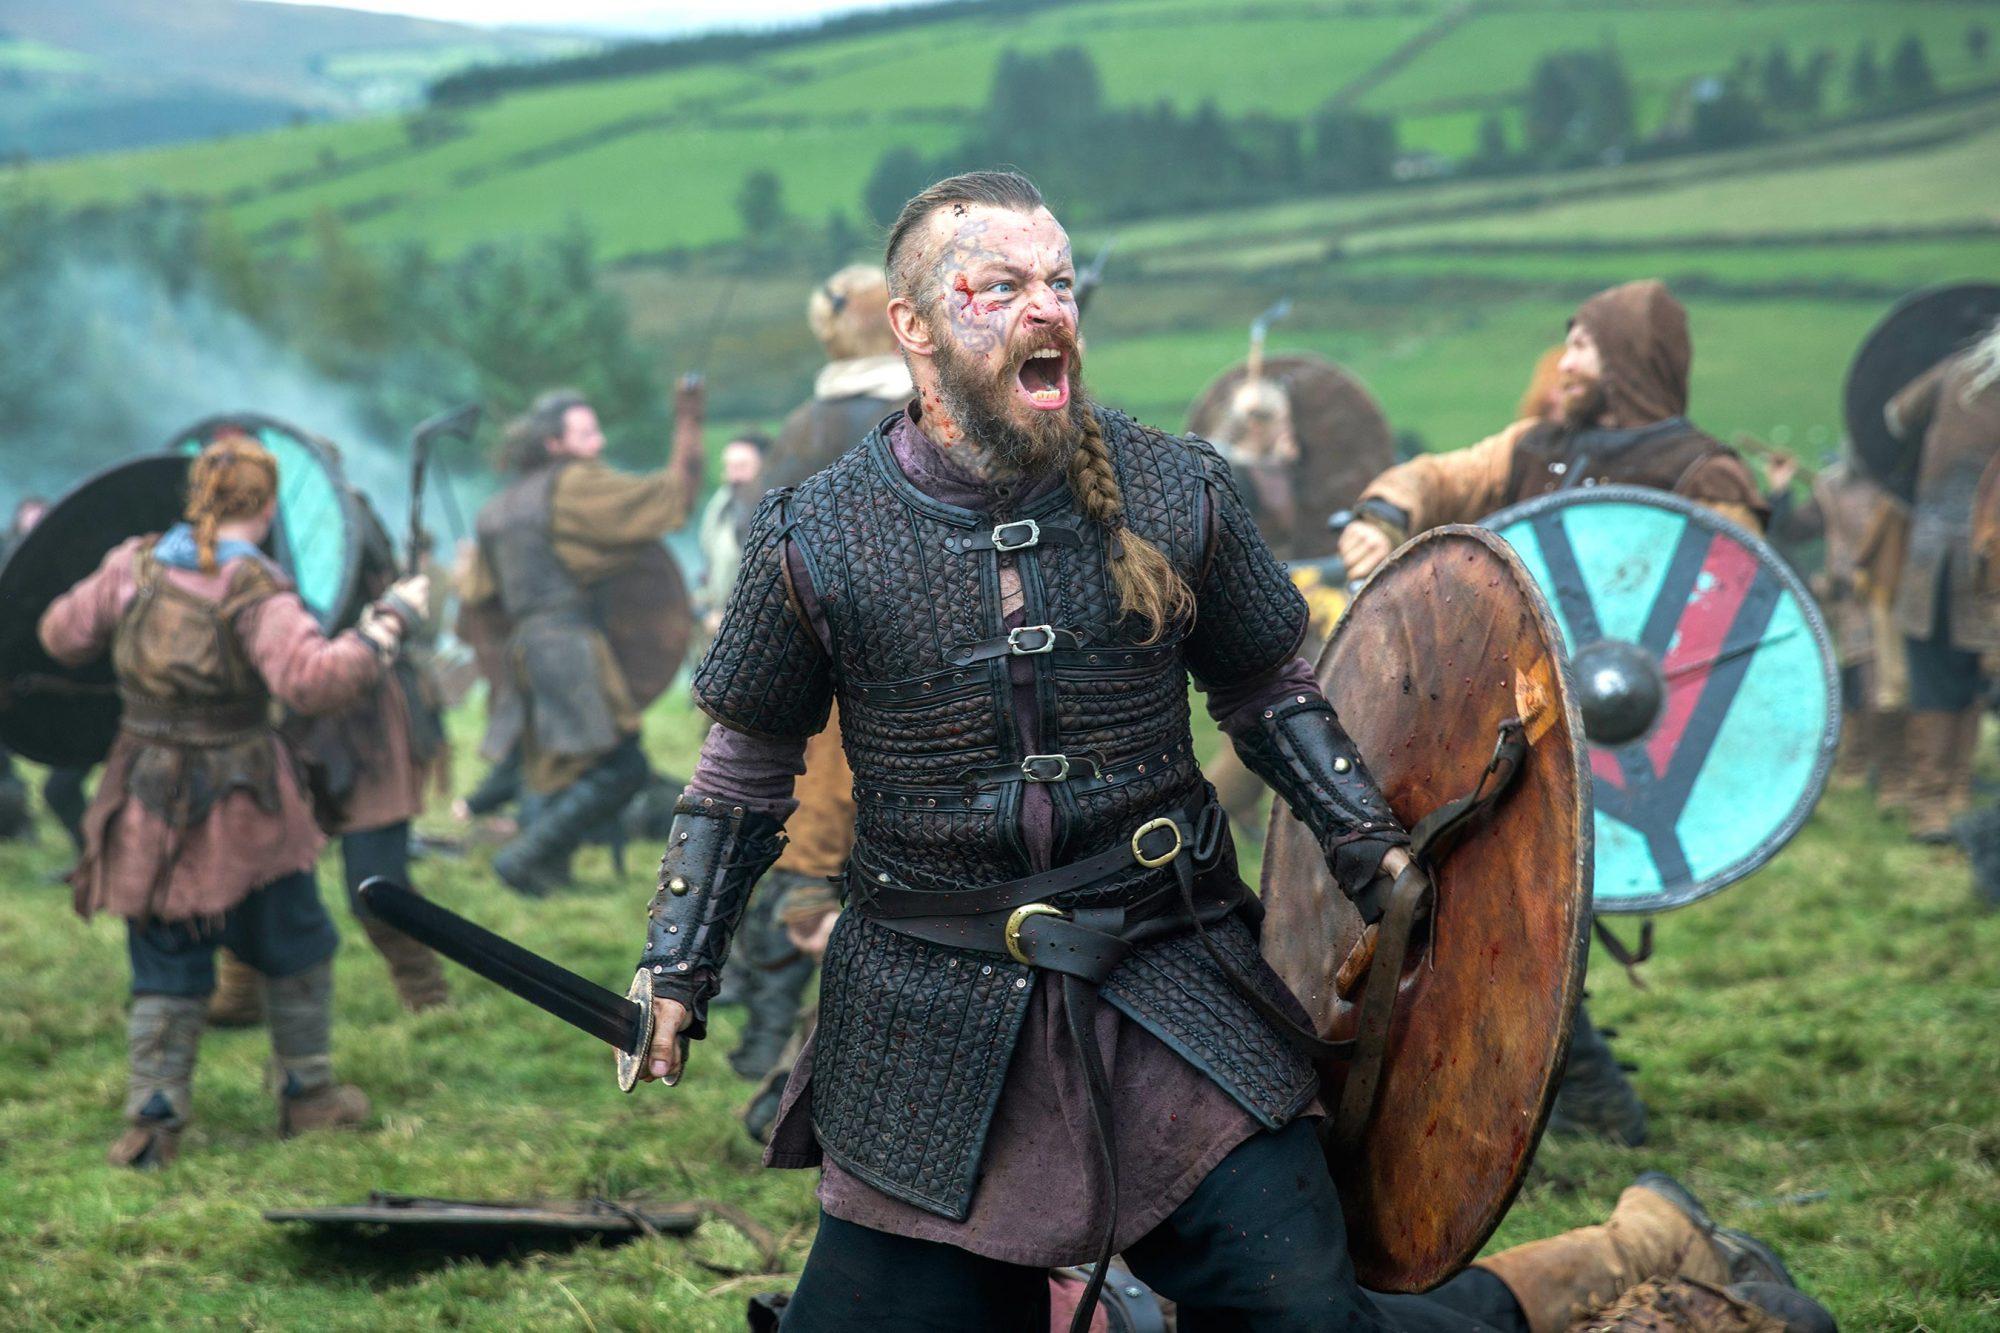 Netflix Greenlights Vikings Spin-off Series Vikings: Valhalla - HeyUGuys